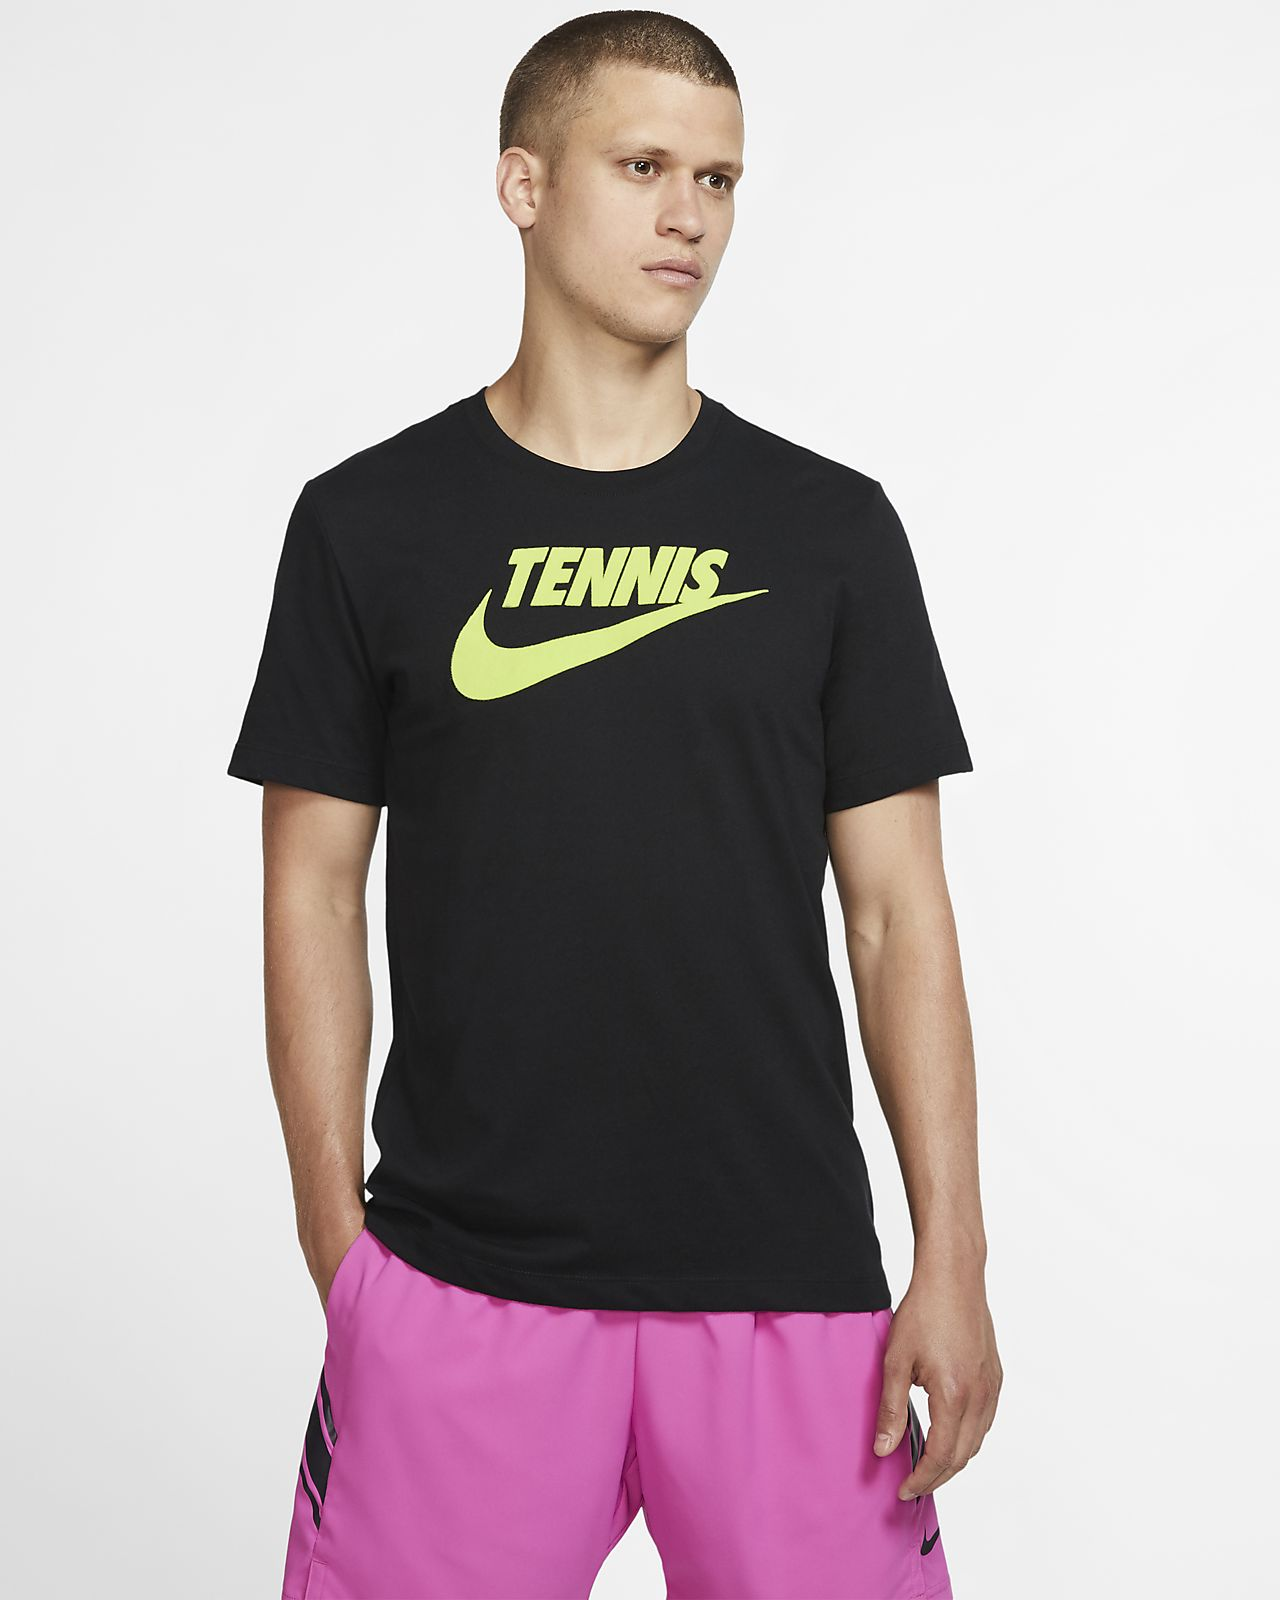 NIKE T SHIRT DRI FIT Maglia Abbigliamento Tennis Sport